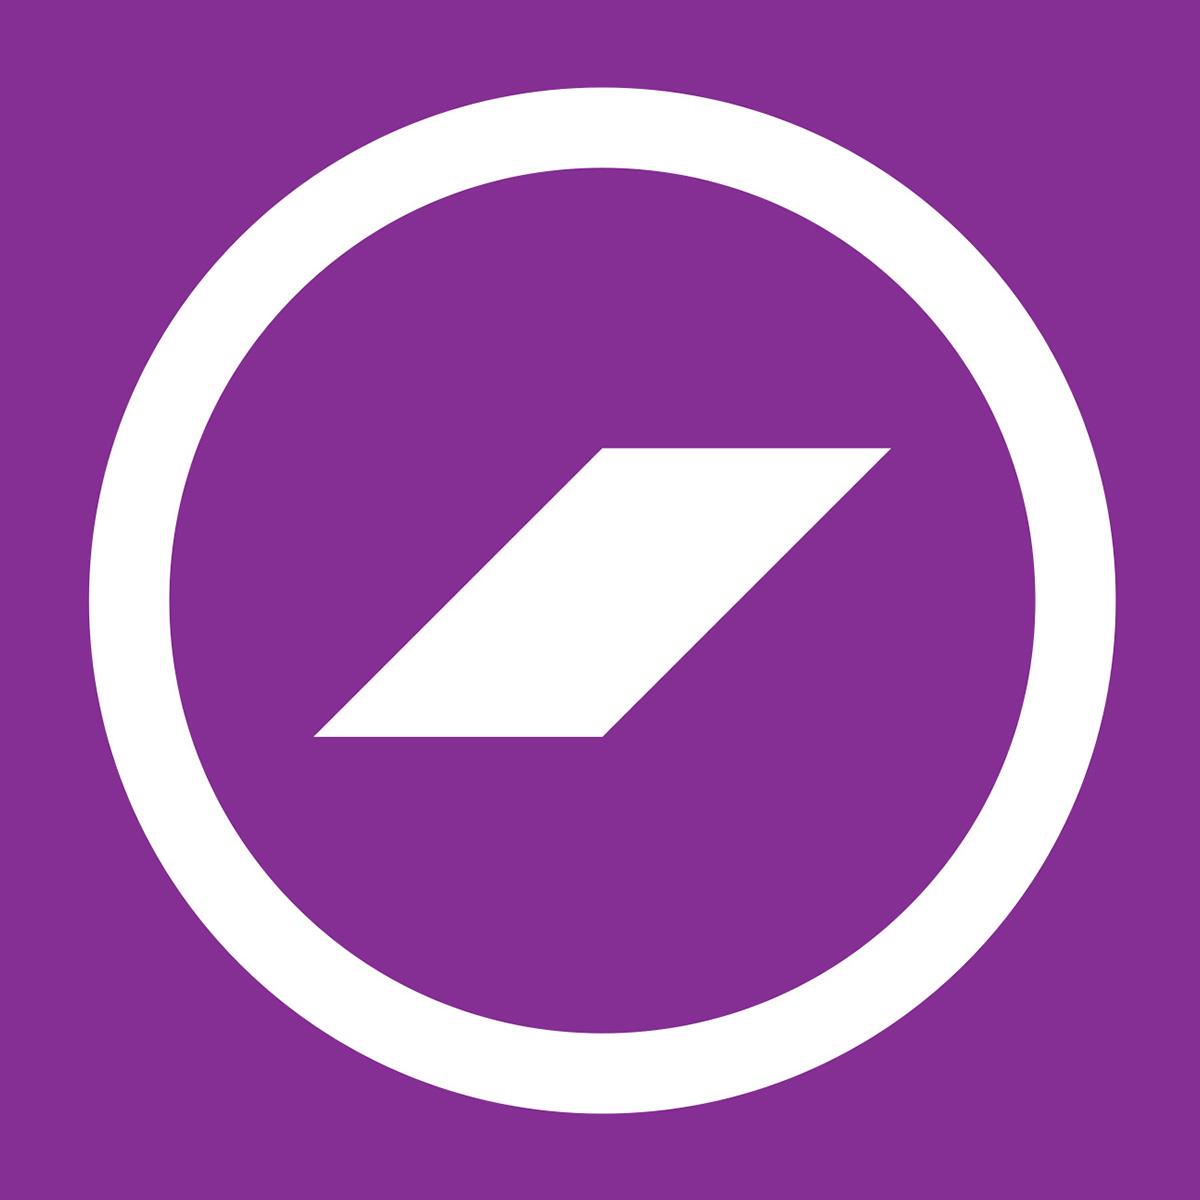 logo firmy Dactyl Group s.r.o.